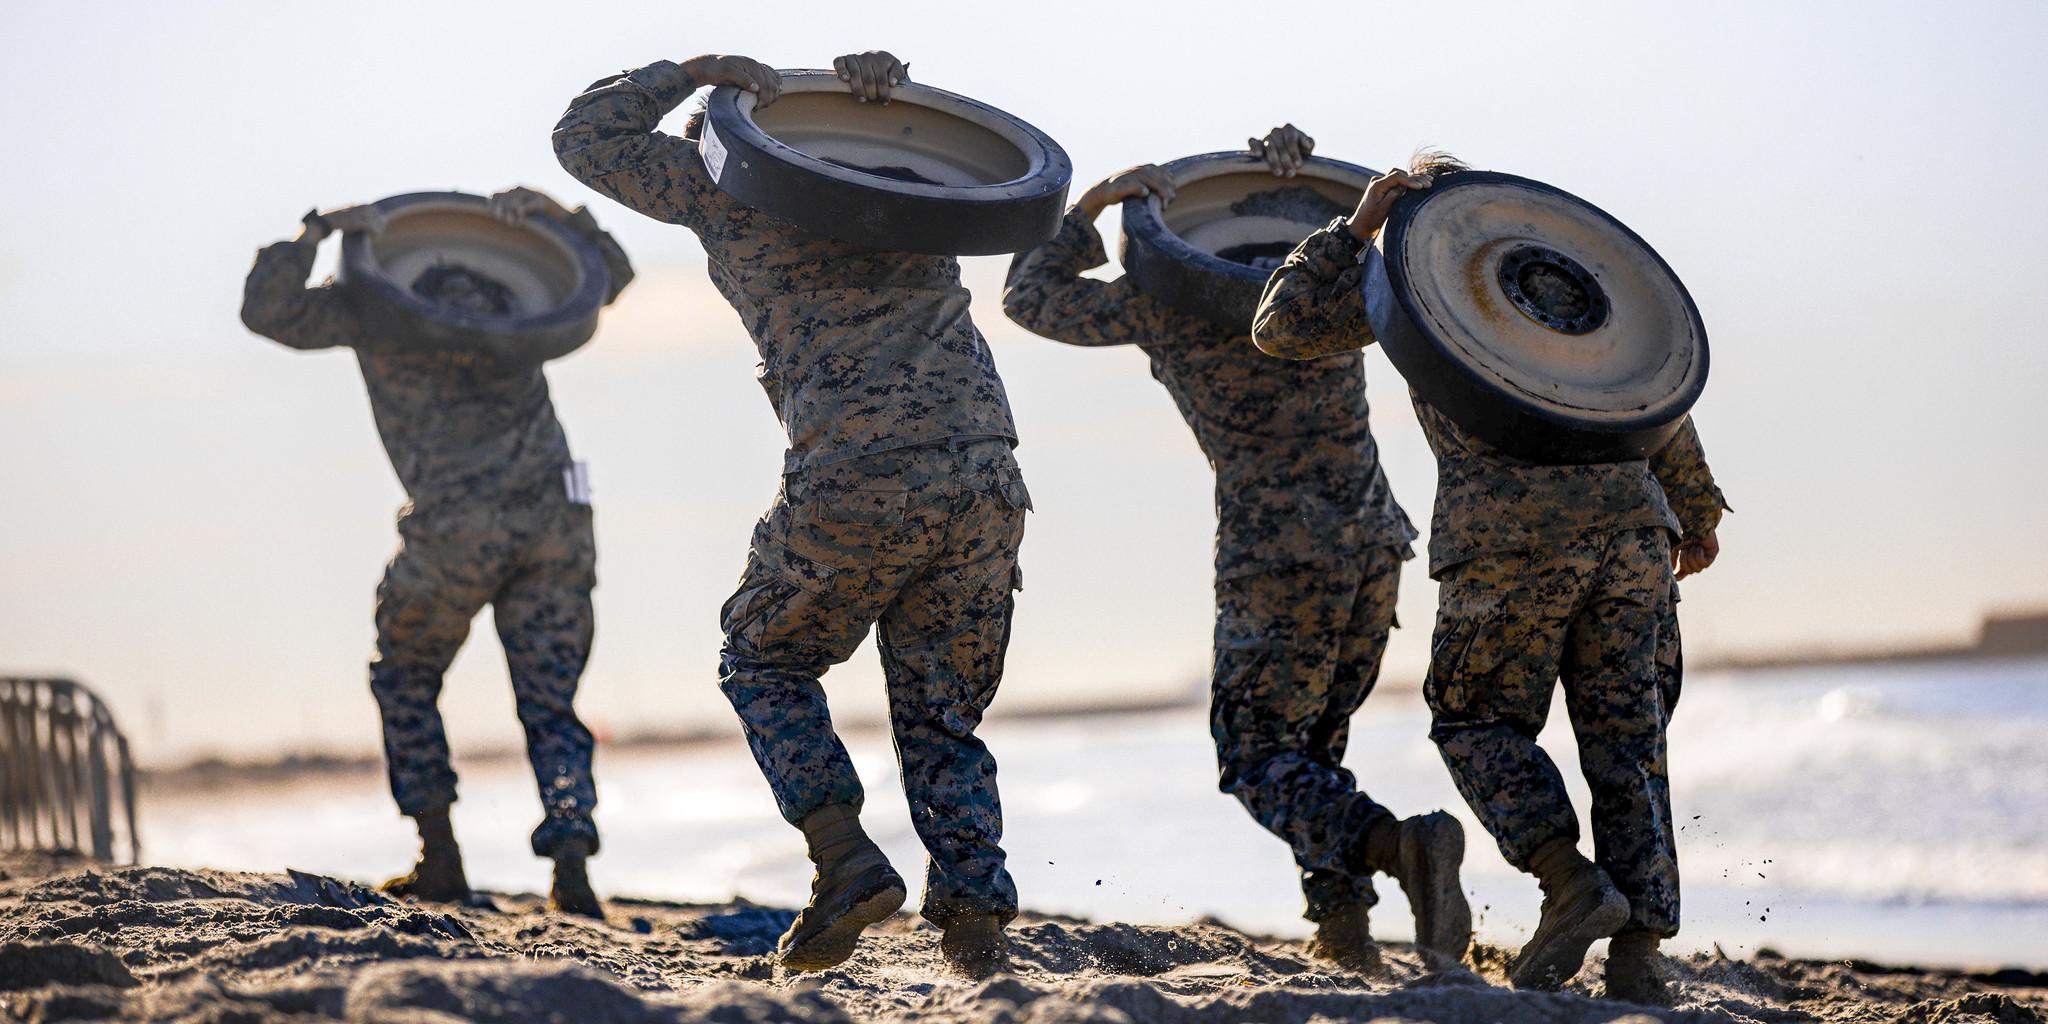 Marines with 1st Marine Division carry track wheels during the Amphibious Combat Endurance Test on Marine Corps Base Camp Pendleton, Calif., Jan. 15, 2021. (Lance Cpl. Roxanna Ortiz/Marine Corps)